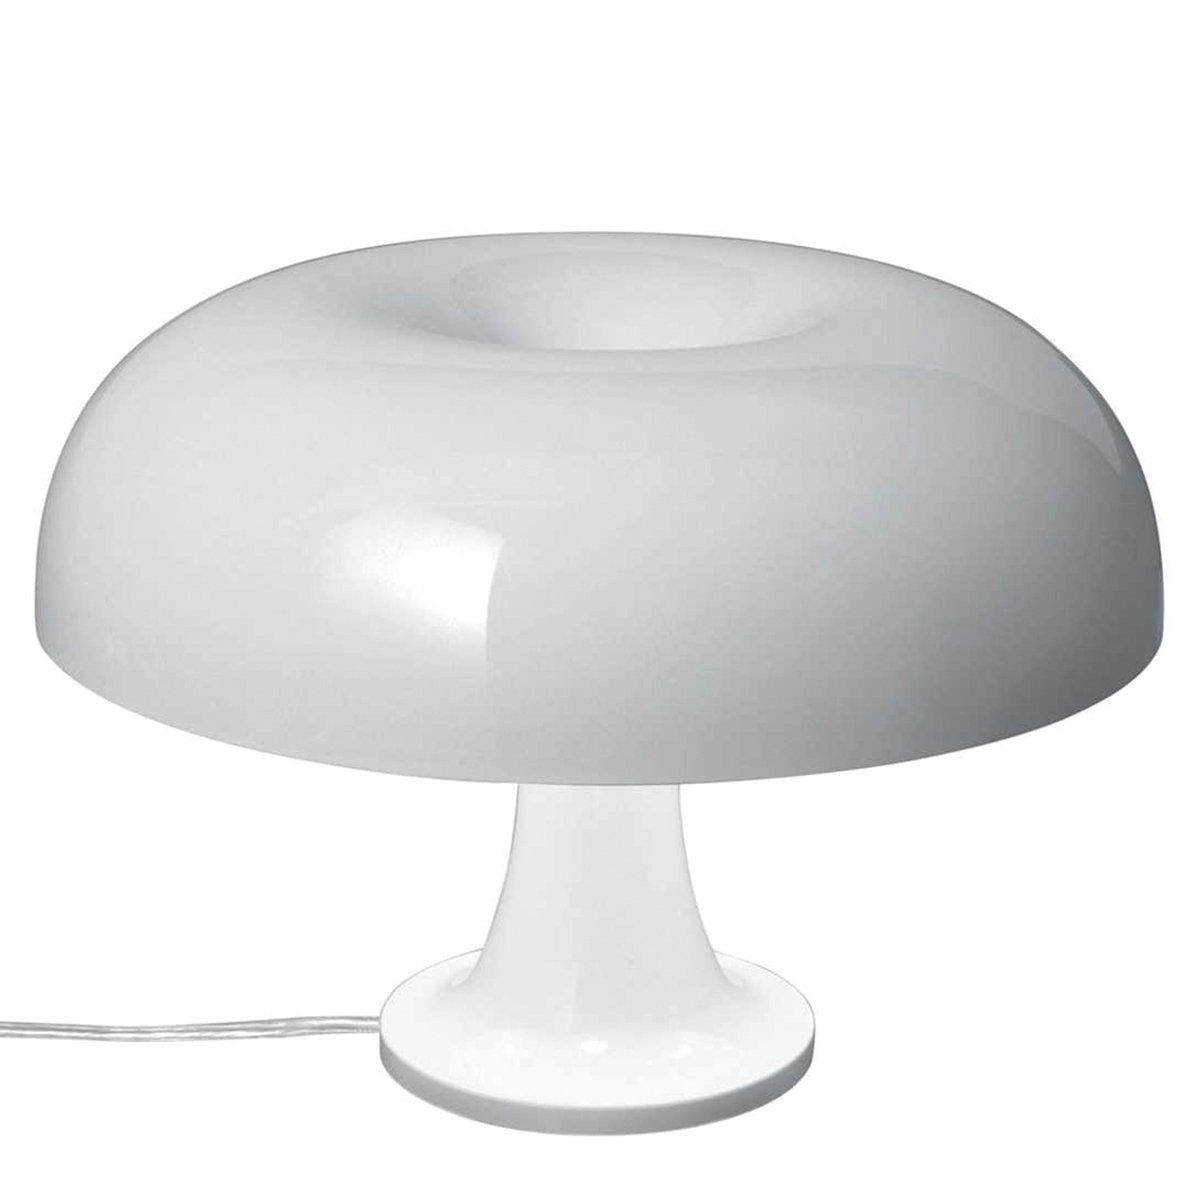 Artemide Nessino Tafellamp Wit